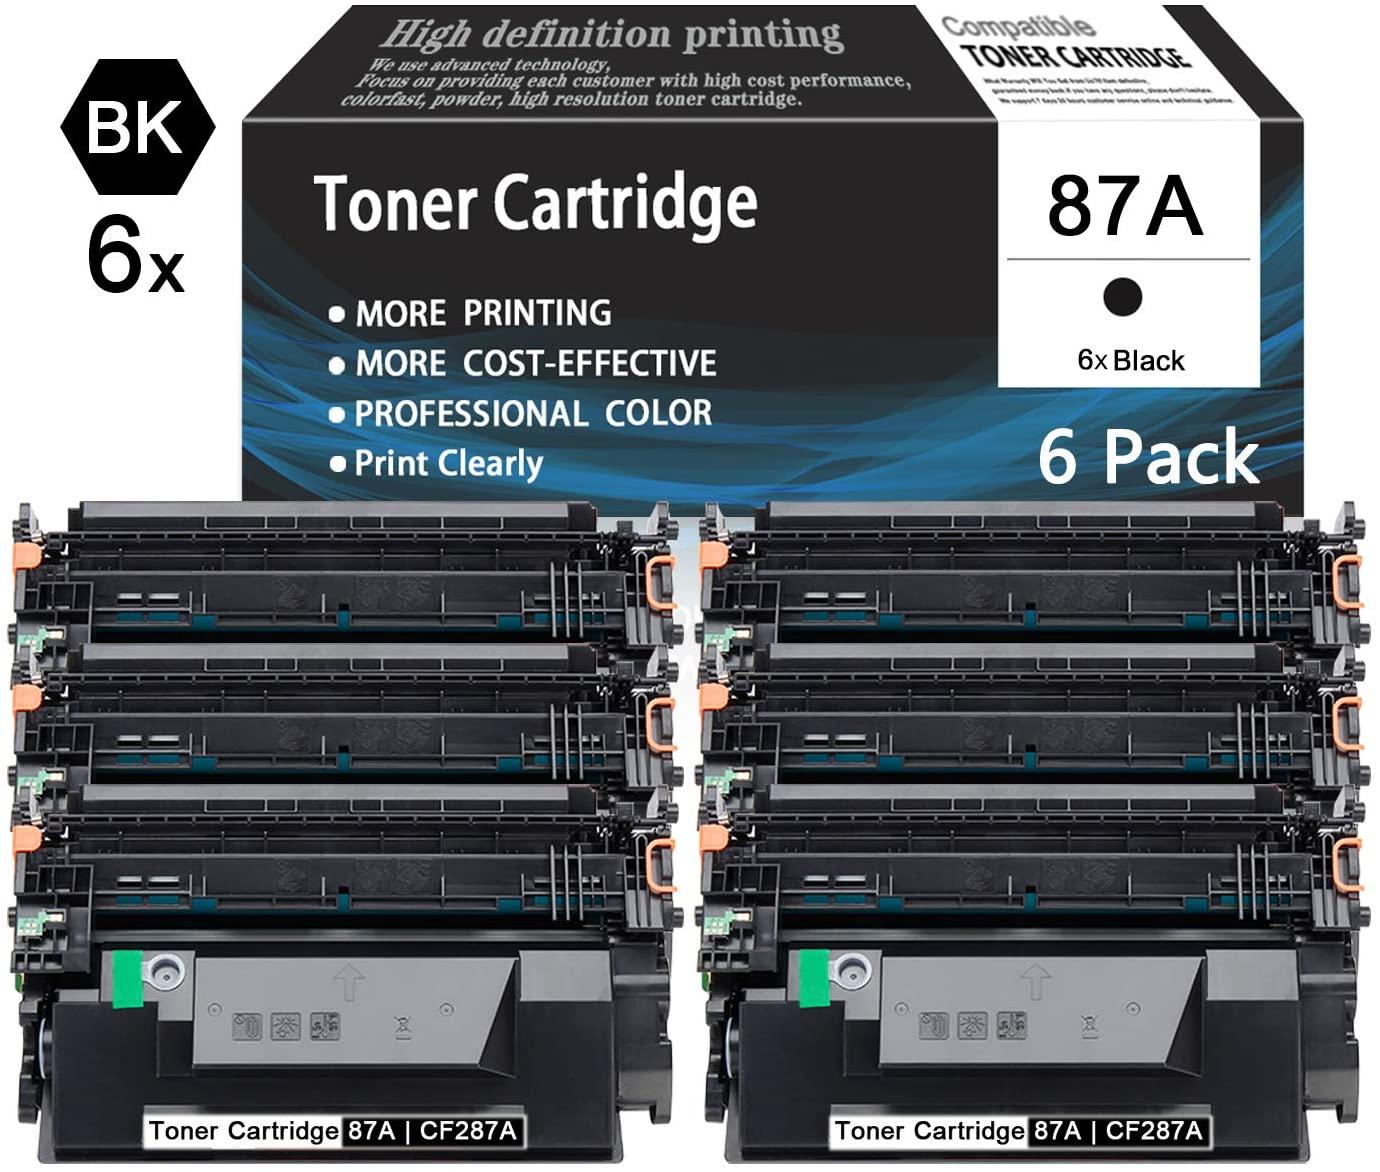 Black87A   CF287A 6-Pack TonerCartridgeCompatibleforHPPrinter M506xm M506n M506dn M501n M501dn M527dn M527f M527z M527c M506dnm Printers Toner Cartridge,Sold by AcToner.